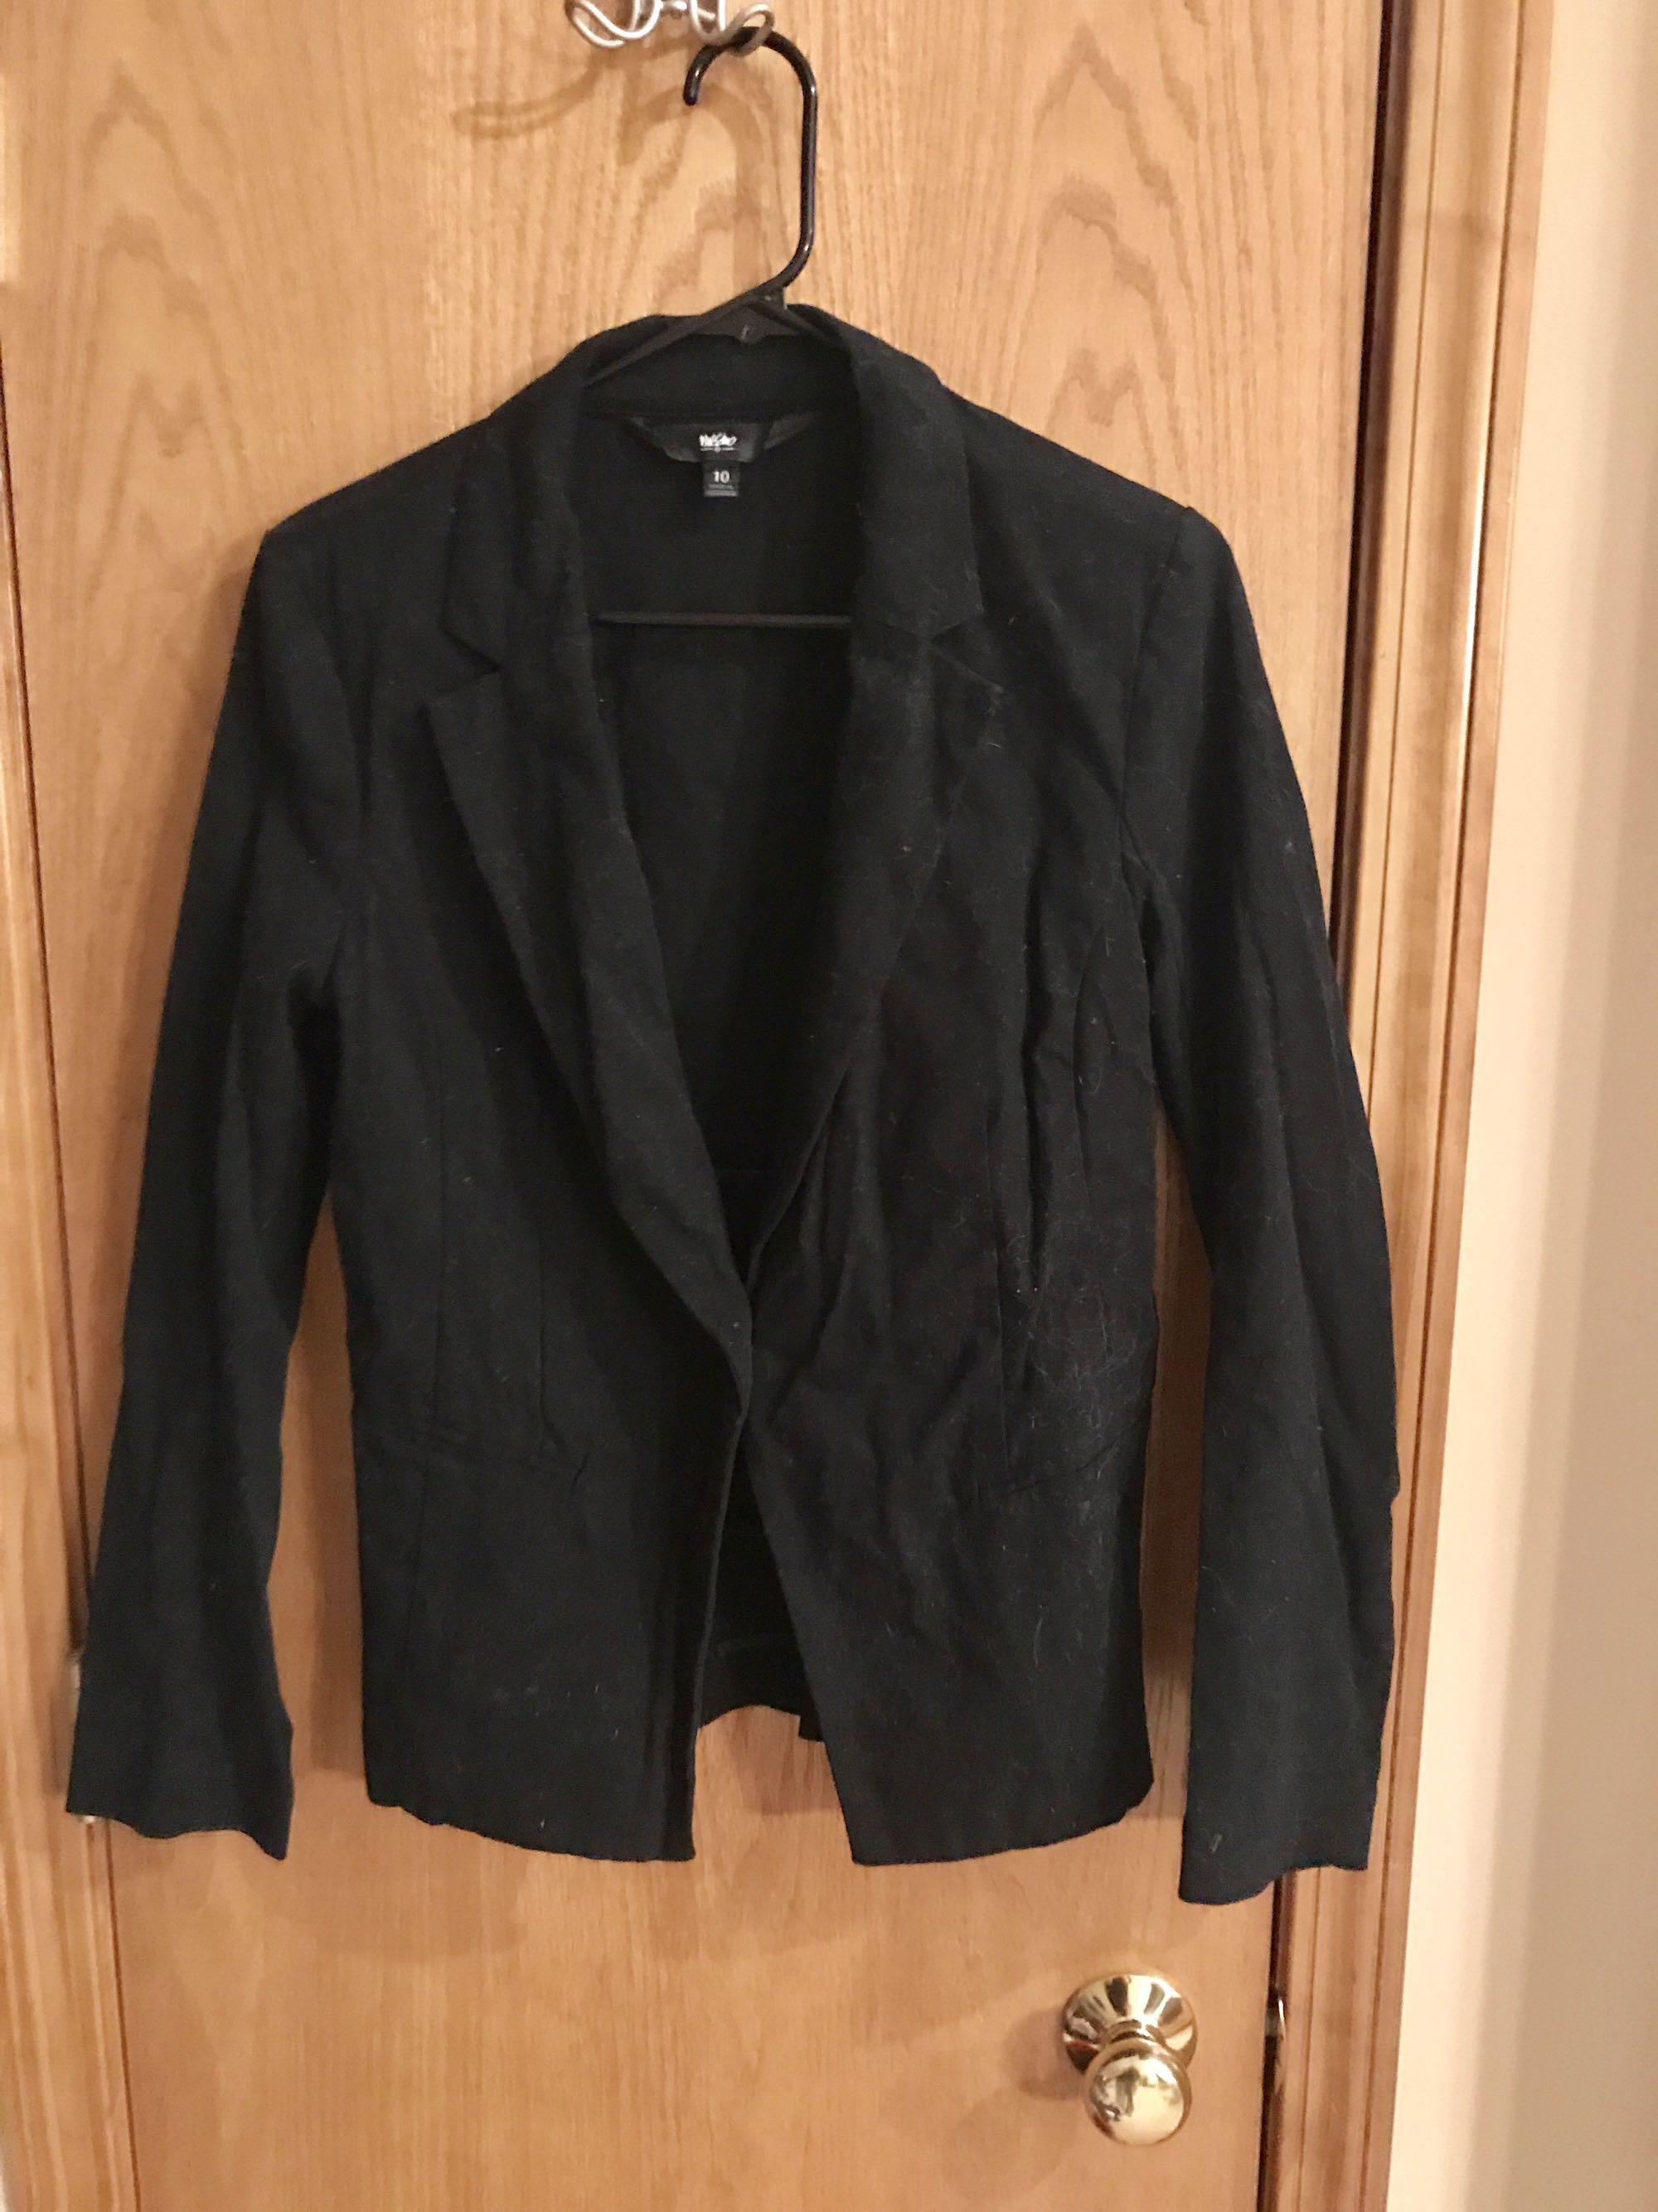 Mossimo brand, black blazer, women's size 10